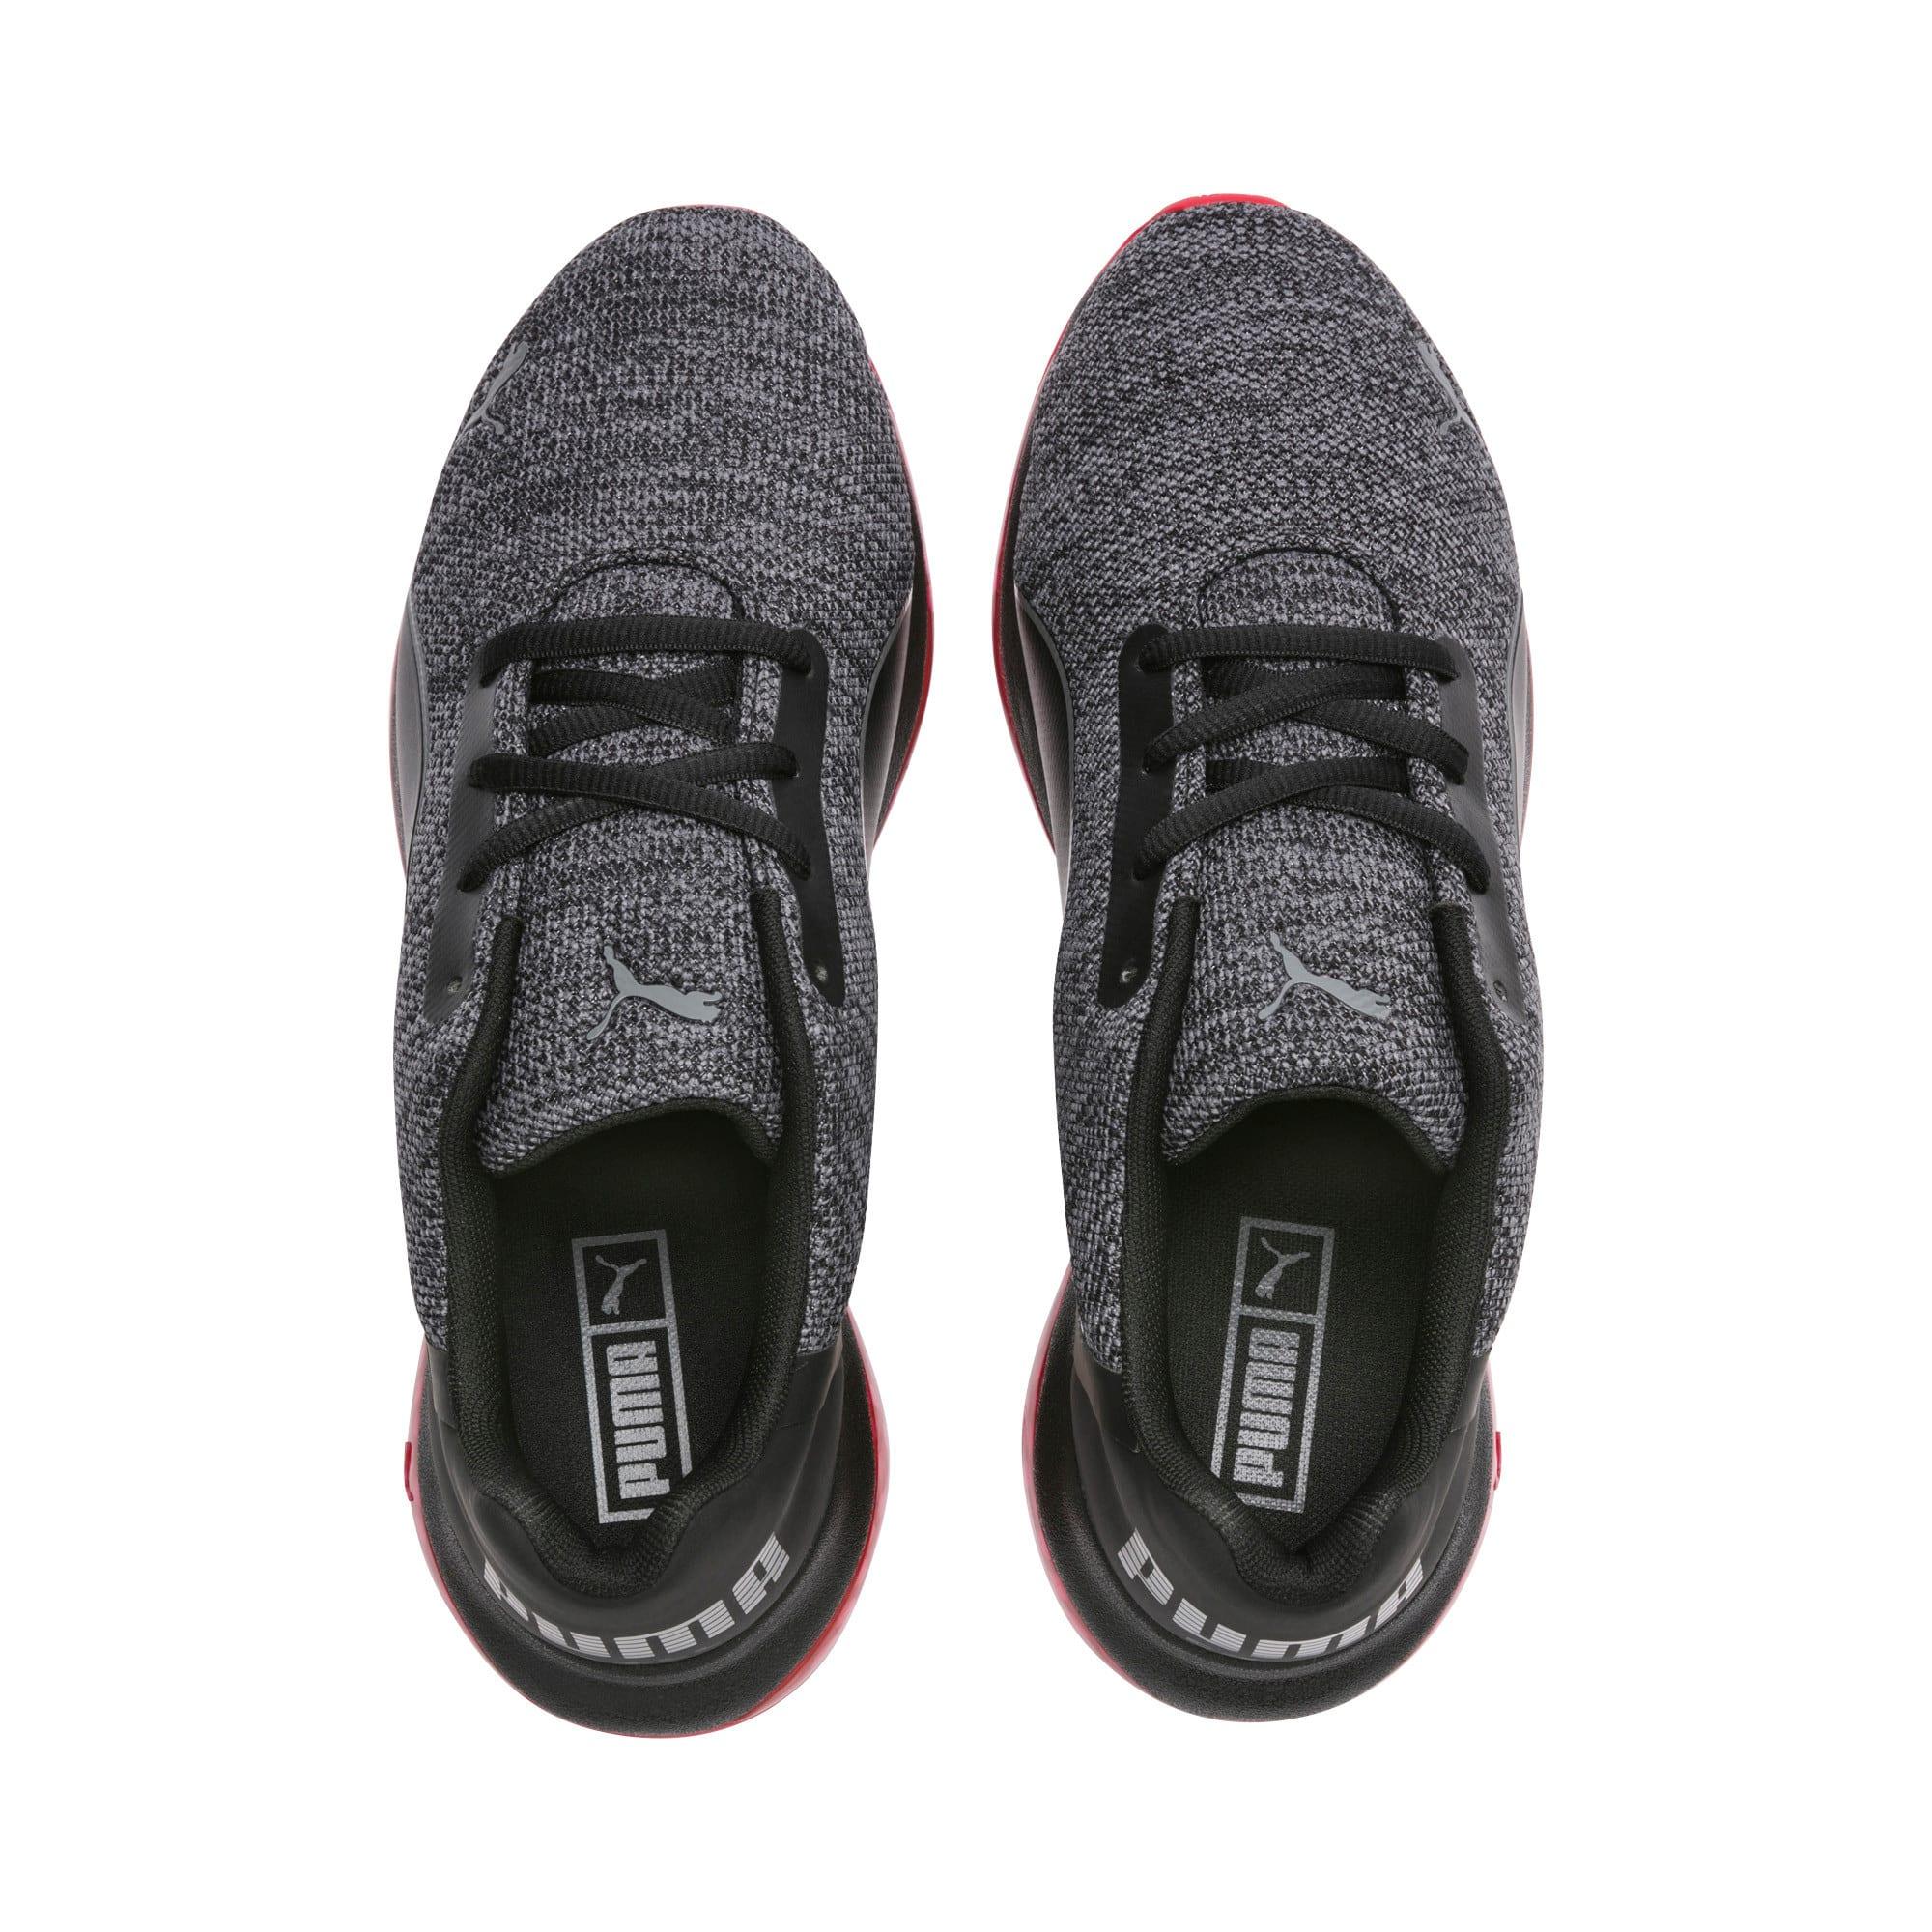 Thumbnail 4 of CELL Ultimate Knit Men's Training Shoes, Pma Blk-QUIET SHDE-Rbbon Red, medium